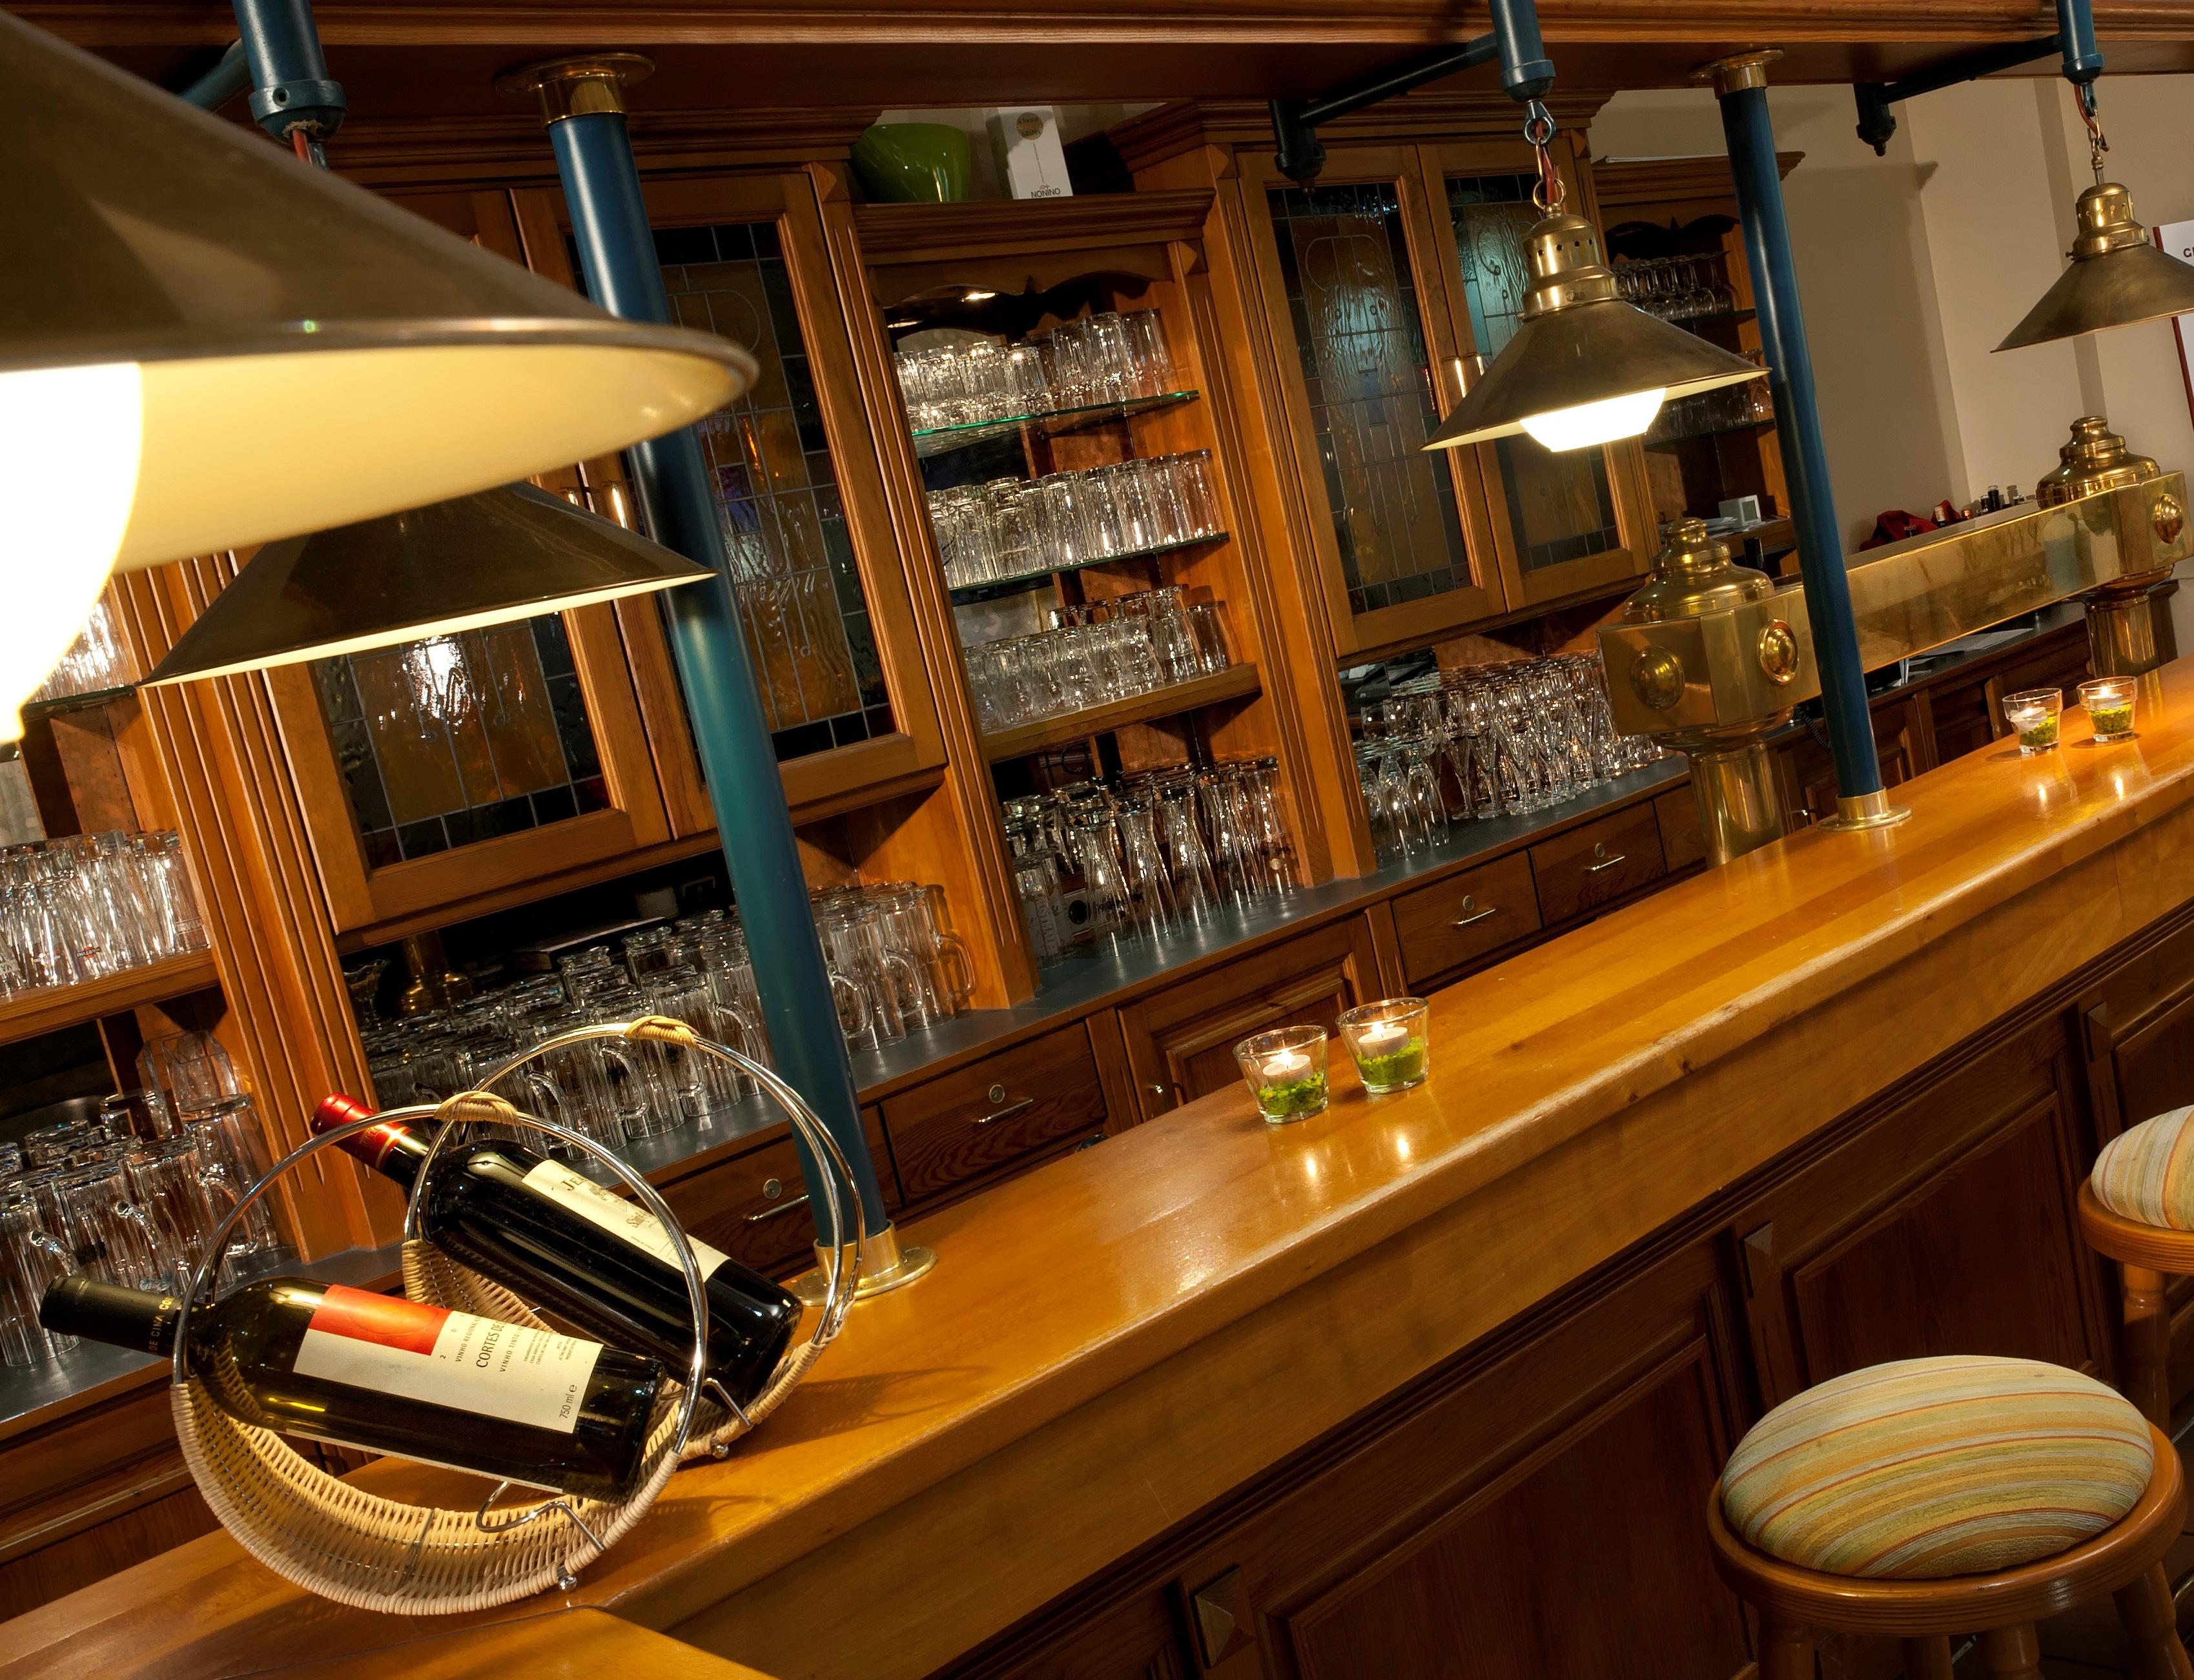 tryp by wyndham hotel bremen airport restaurant fr hst cksbuffet bar. Black Bedroom Furniture Sets. Home Design Ideas